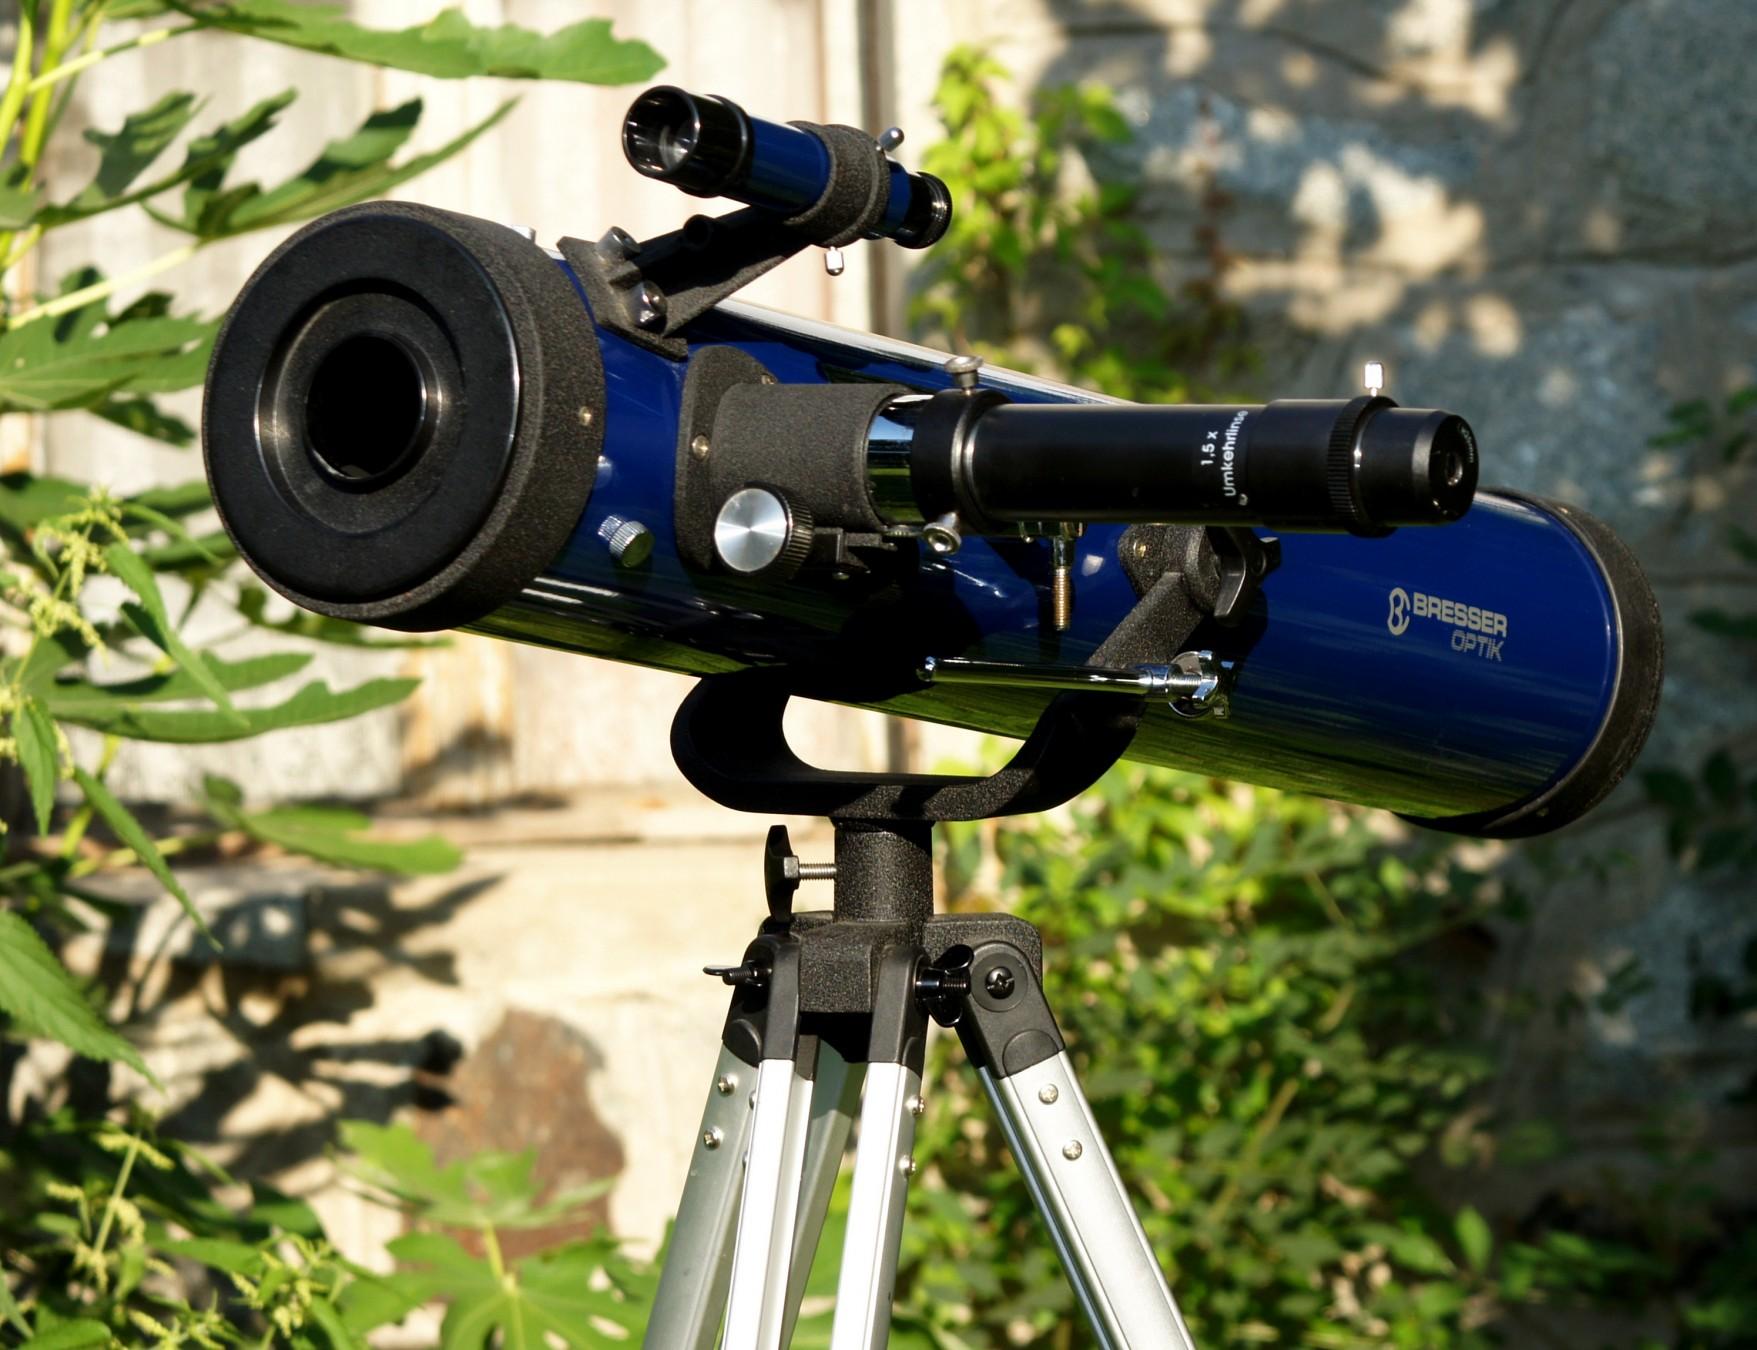 Bresser optik teleskop teleskope teleskope